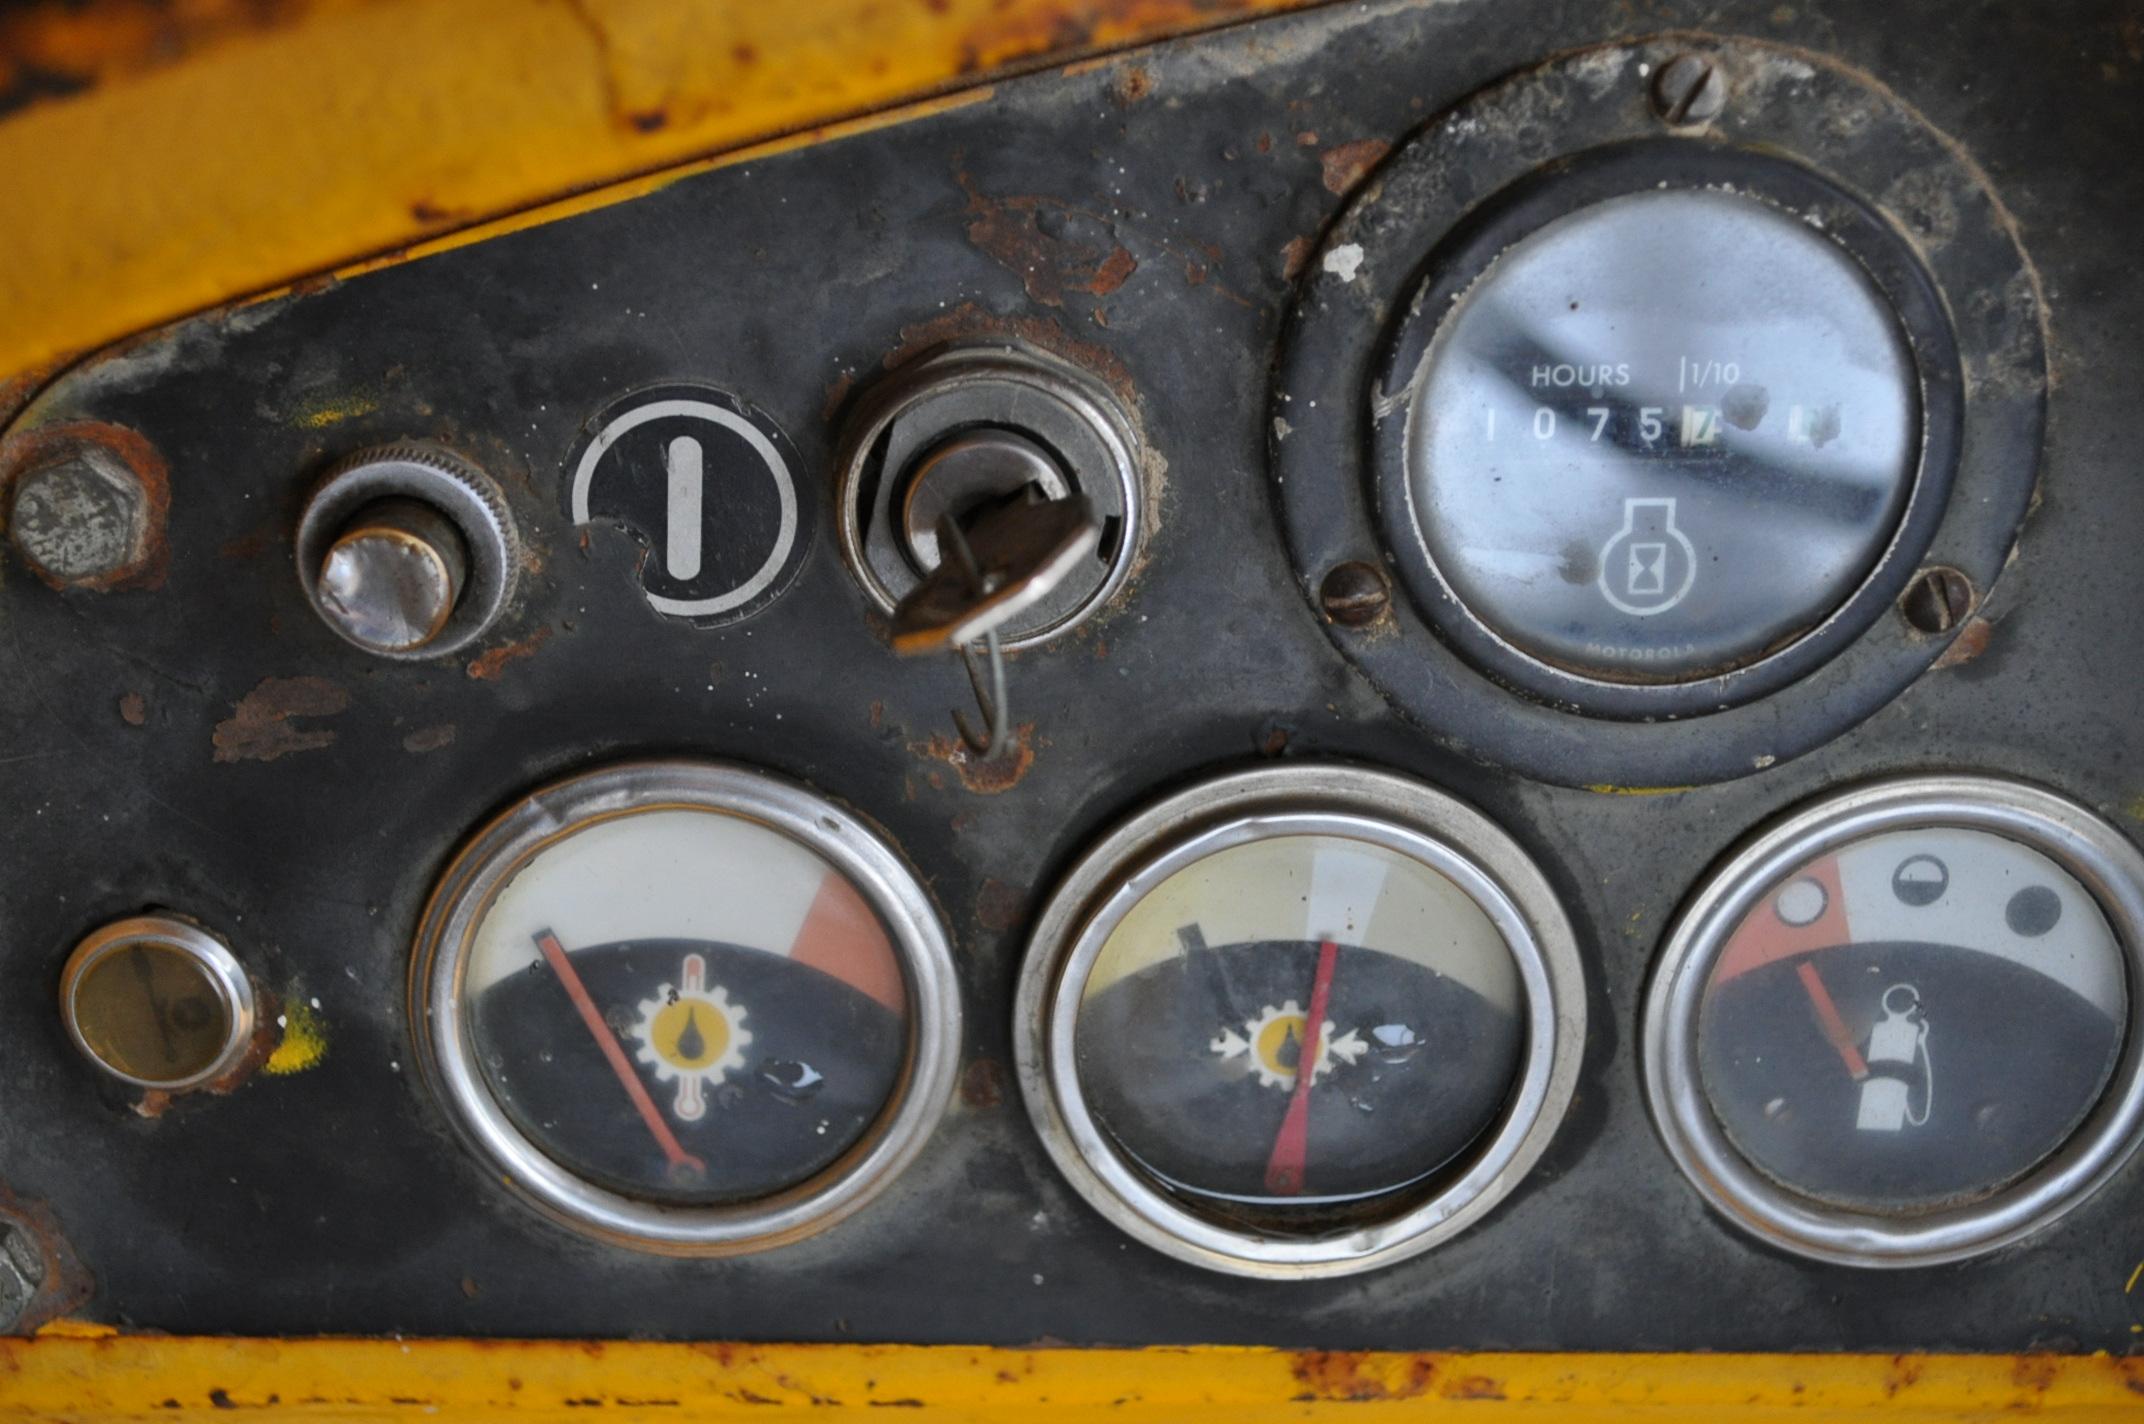 John Deere 544 Payloader, 17.5-25 tires, shows 1074 hrs, SN 0767621 - Image 14 of 16